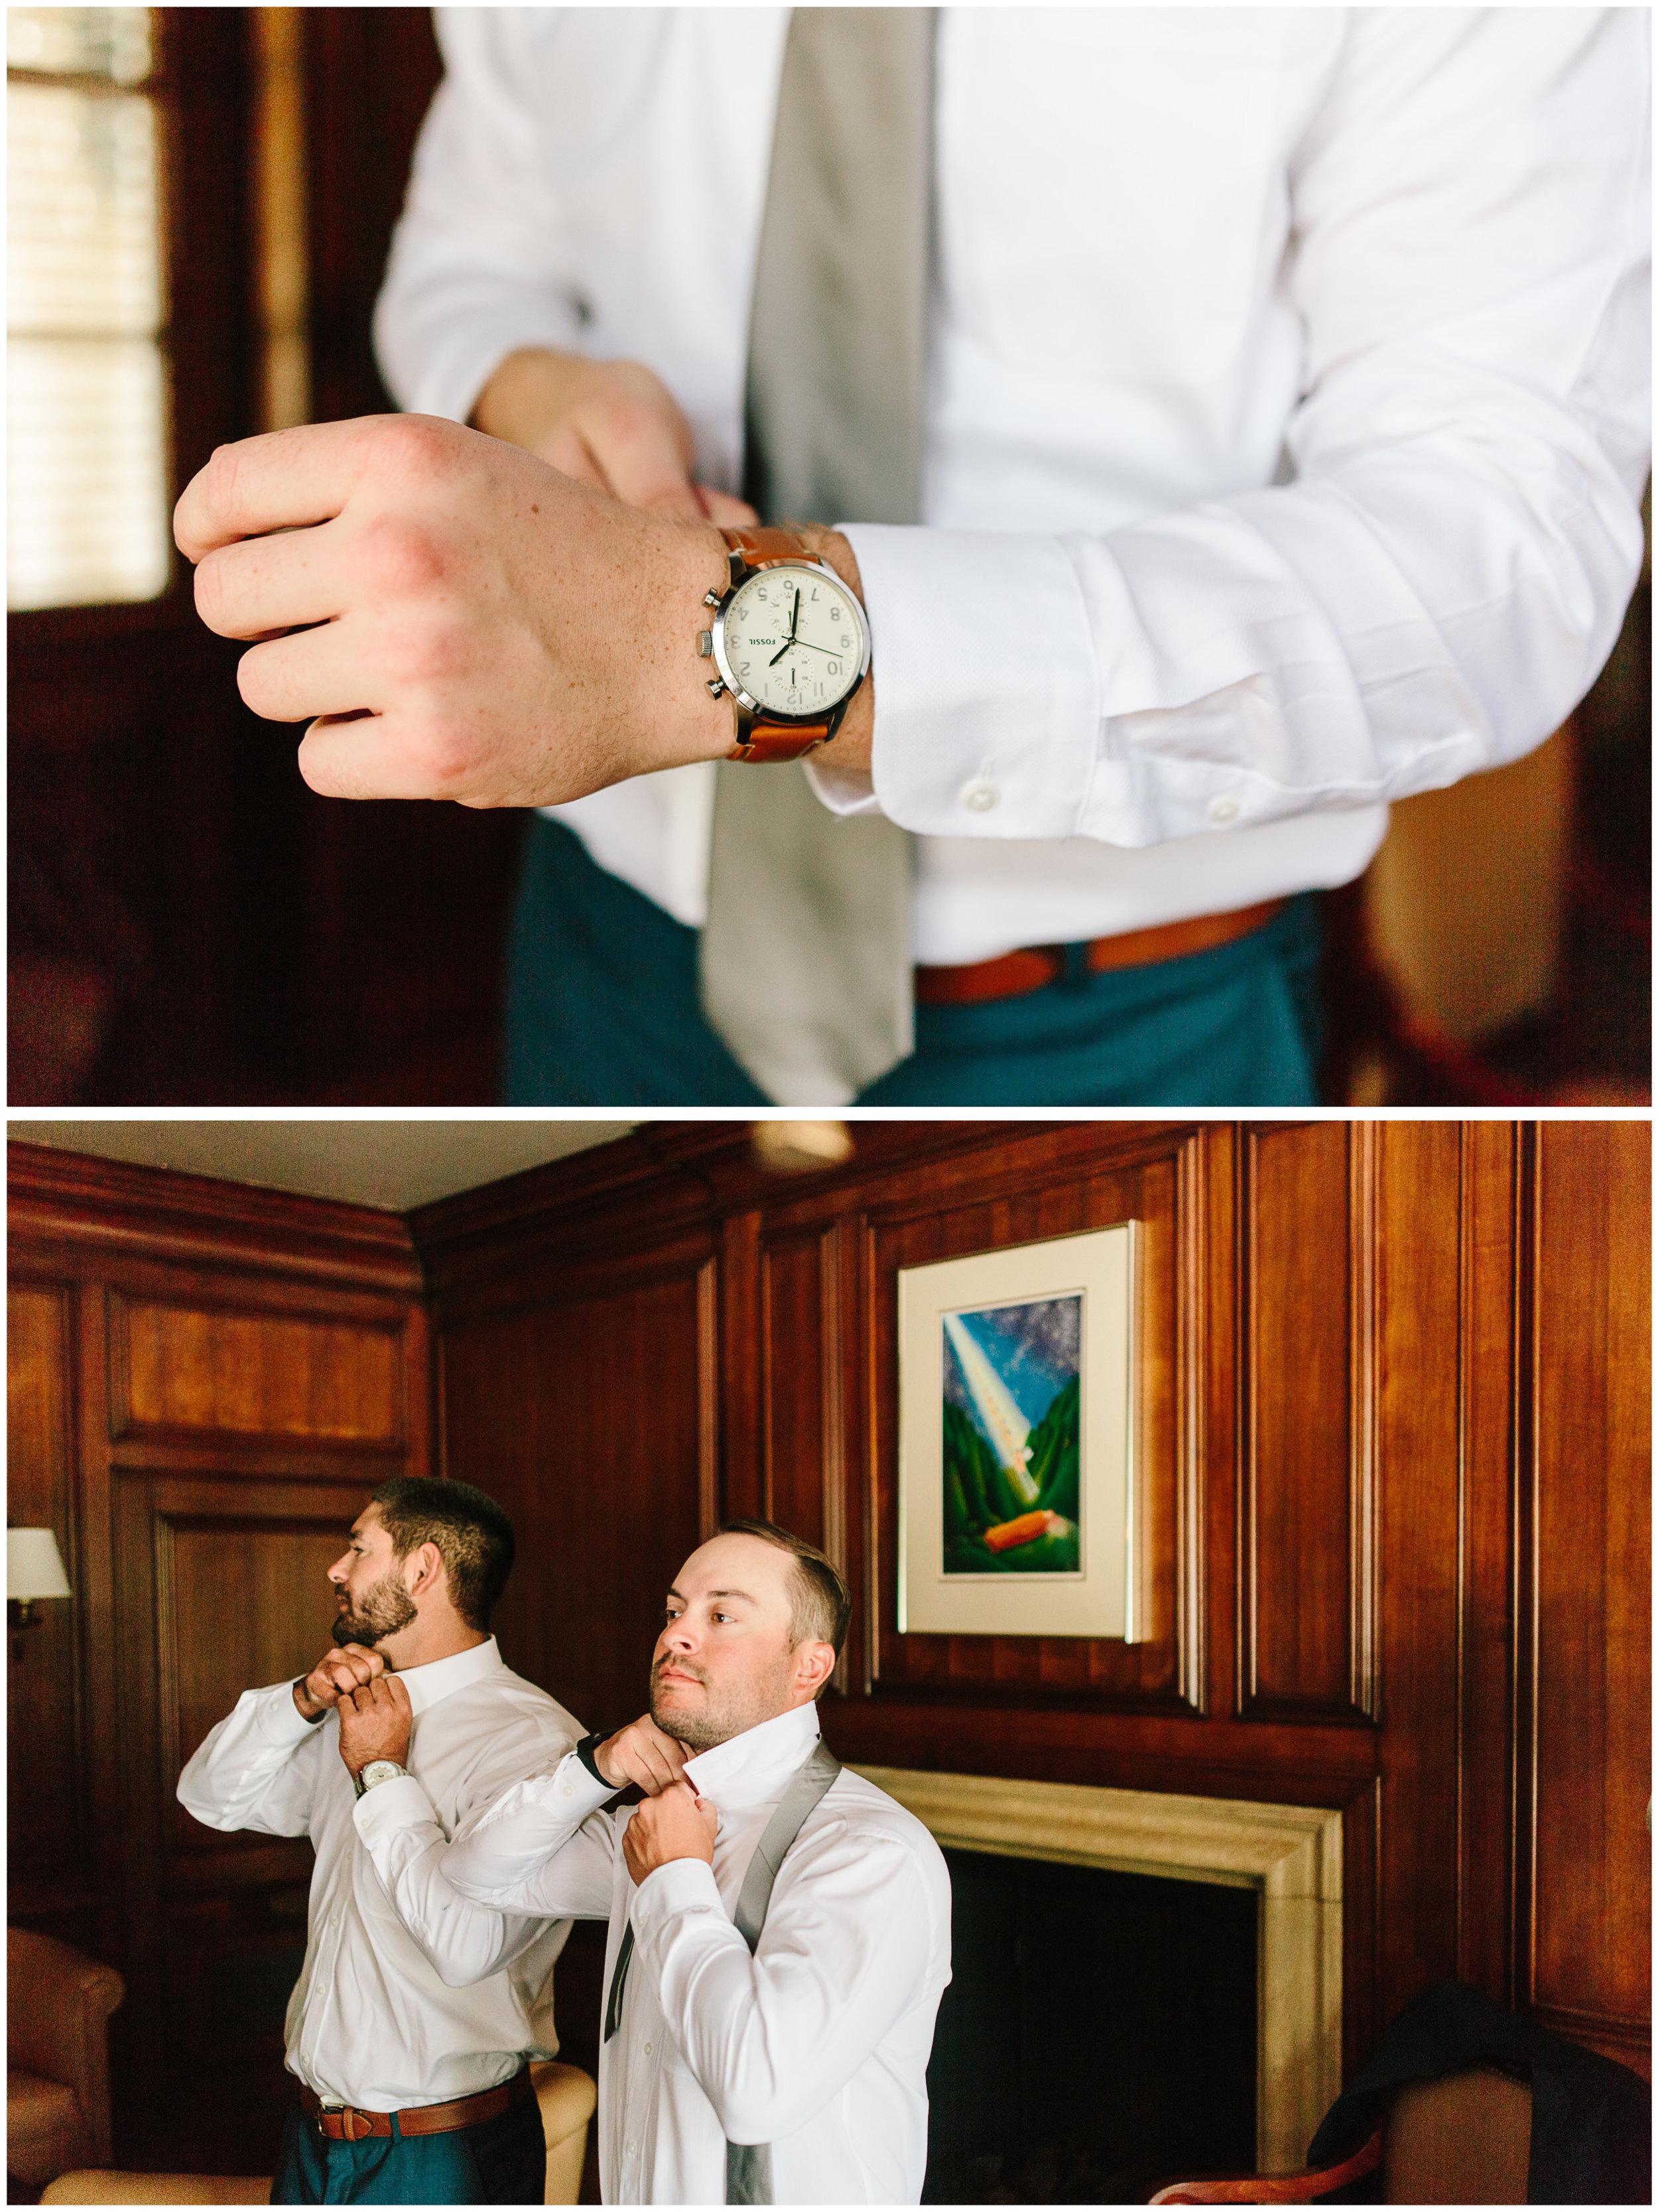 ann_arbor_michigan_wedding_24.jpg